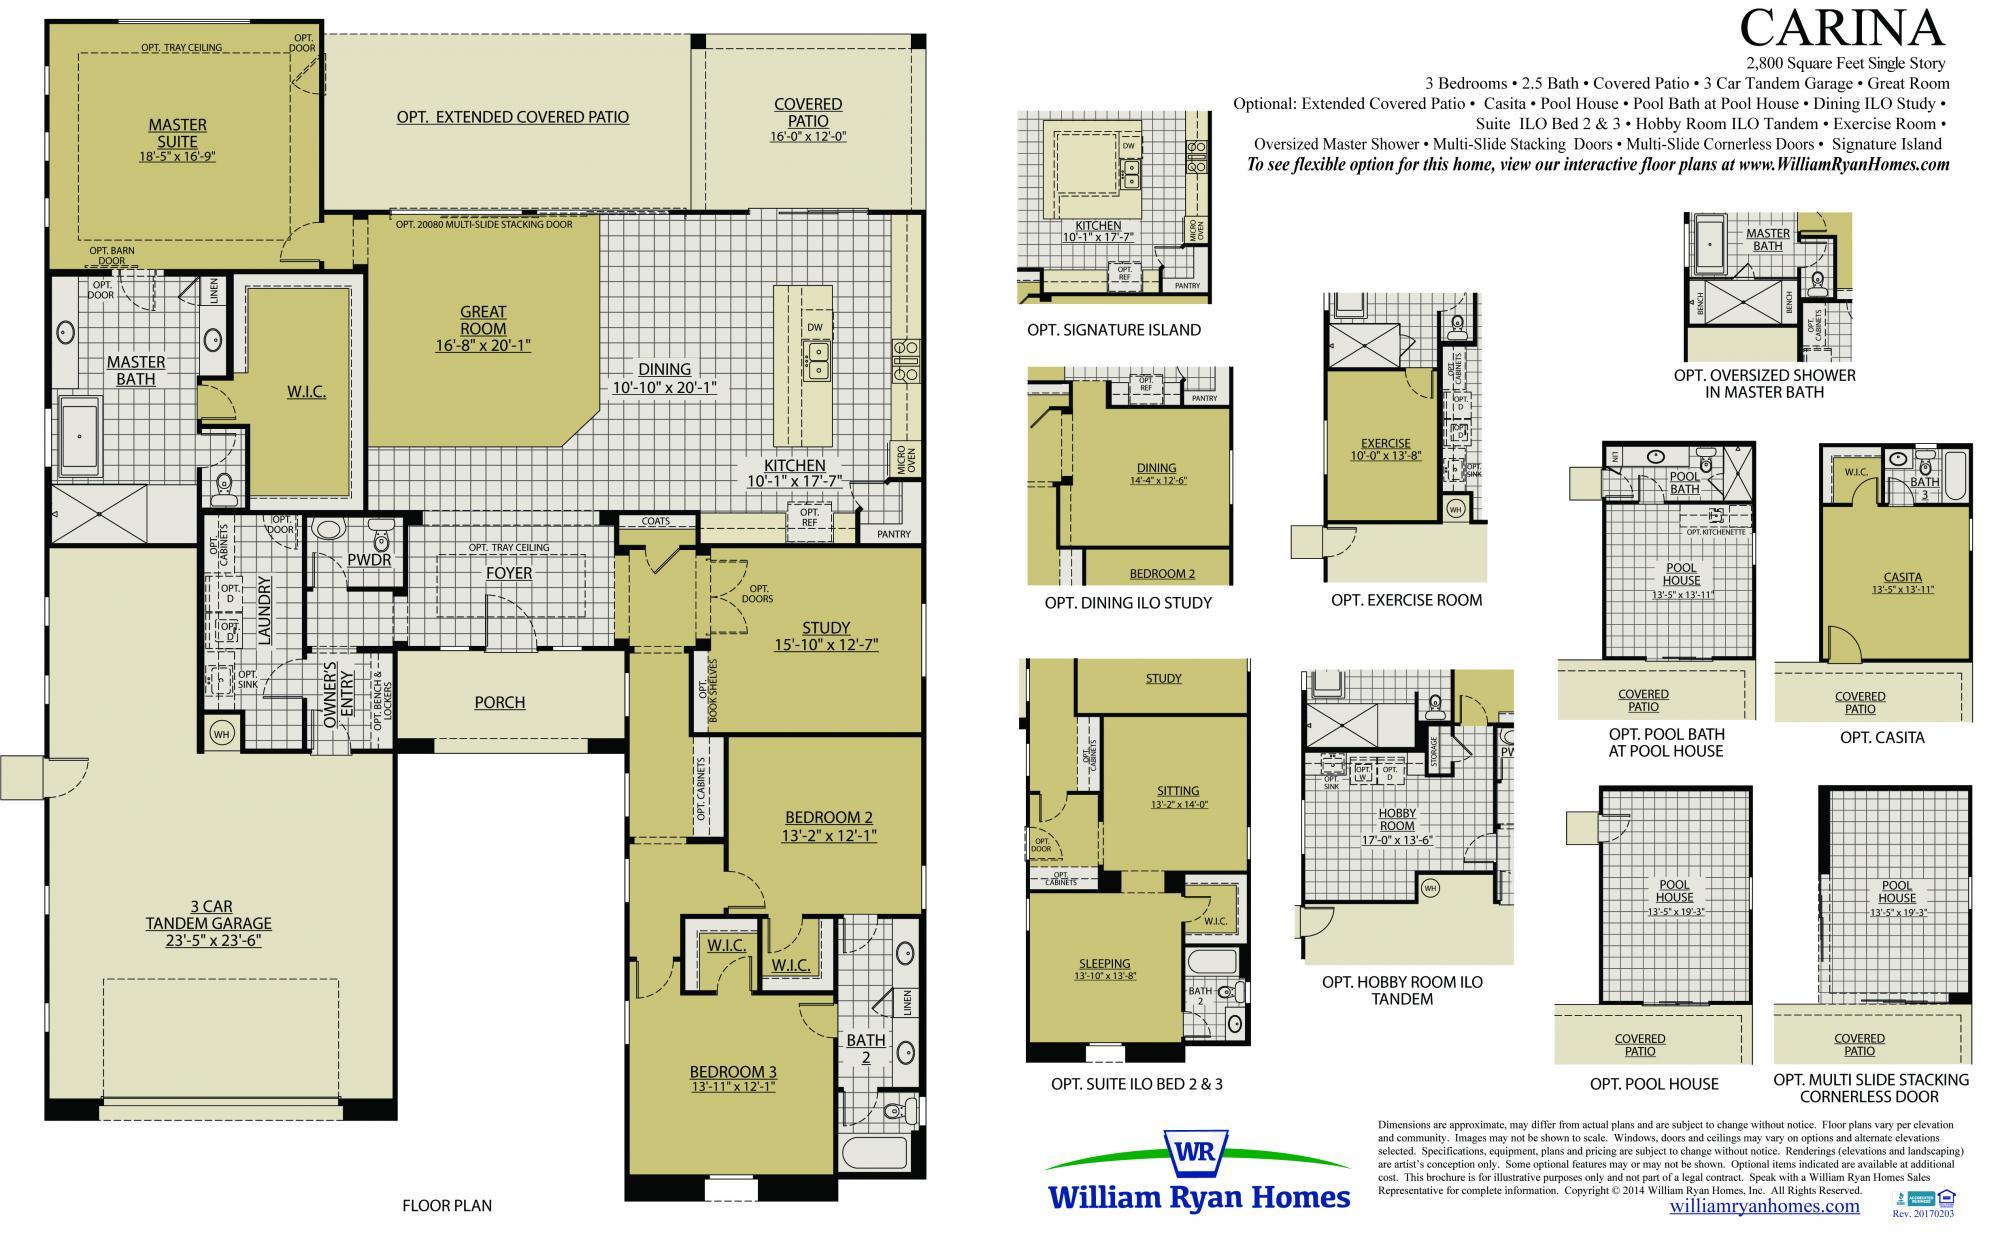 Carina Plan William Ryan Homes John Deutsch Sells Homes In Estrella Mountain Call Me